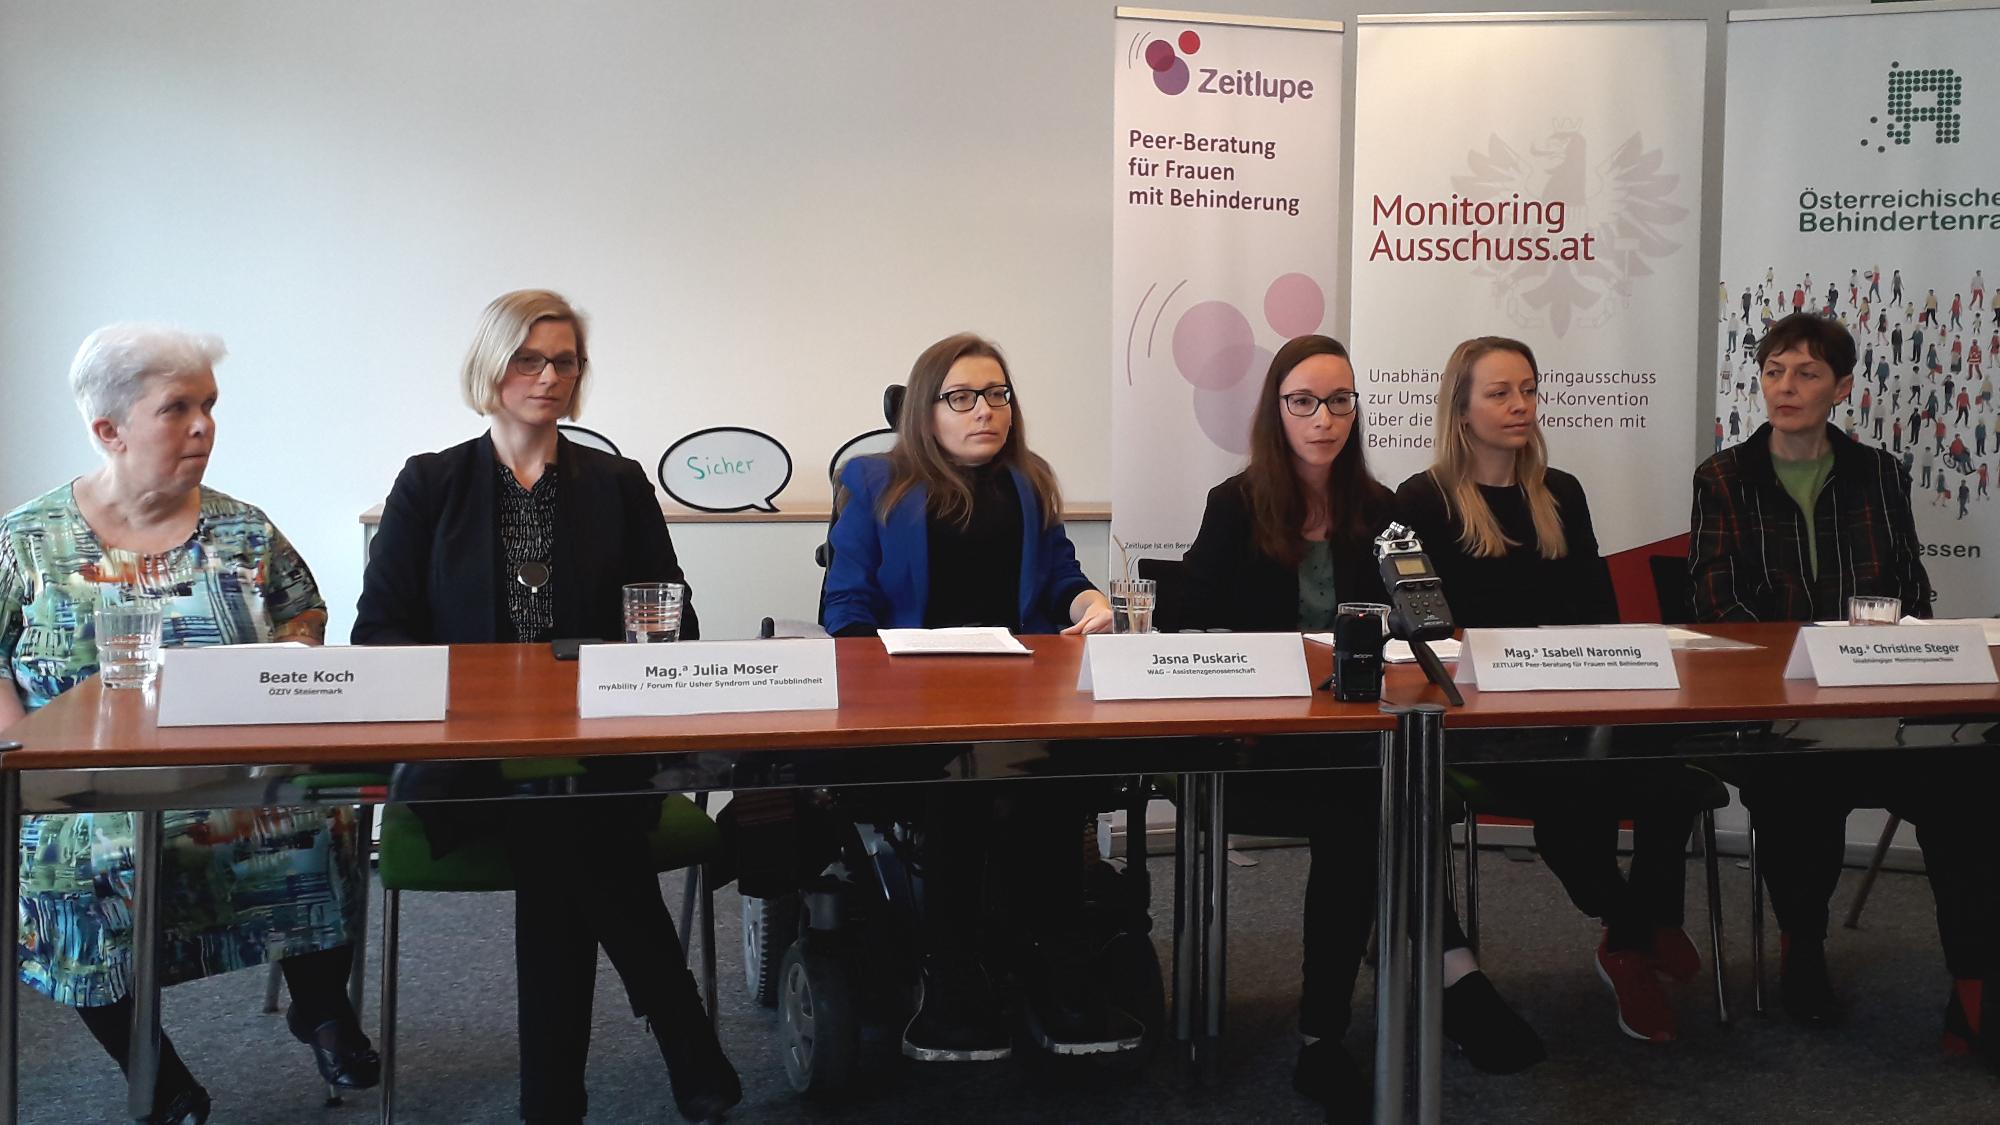 Beate Koch, Julia Moser, Jasna Puskaric, Isabell Naronnig, Christine Steger und Gabriele Sprengseis